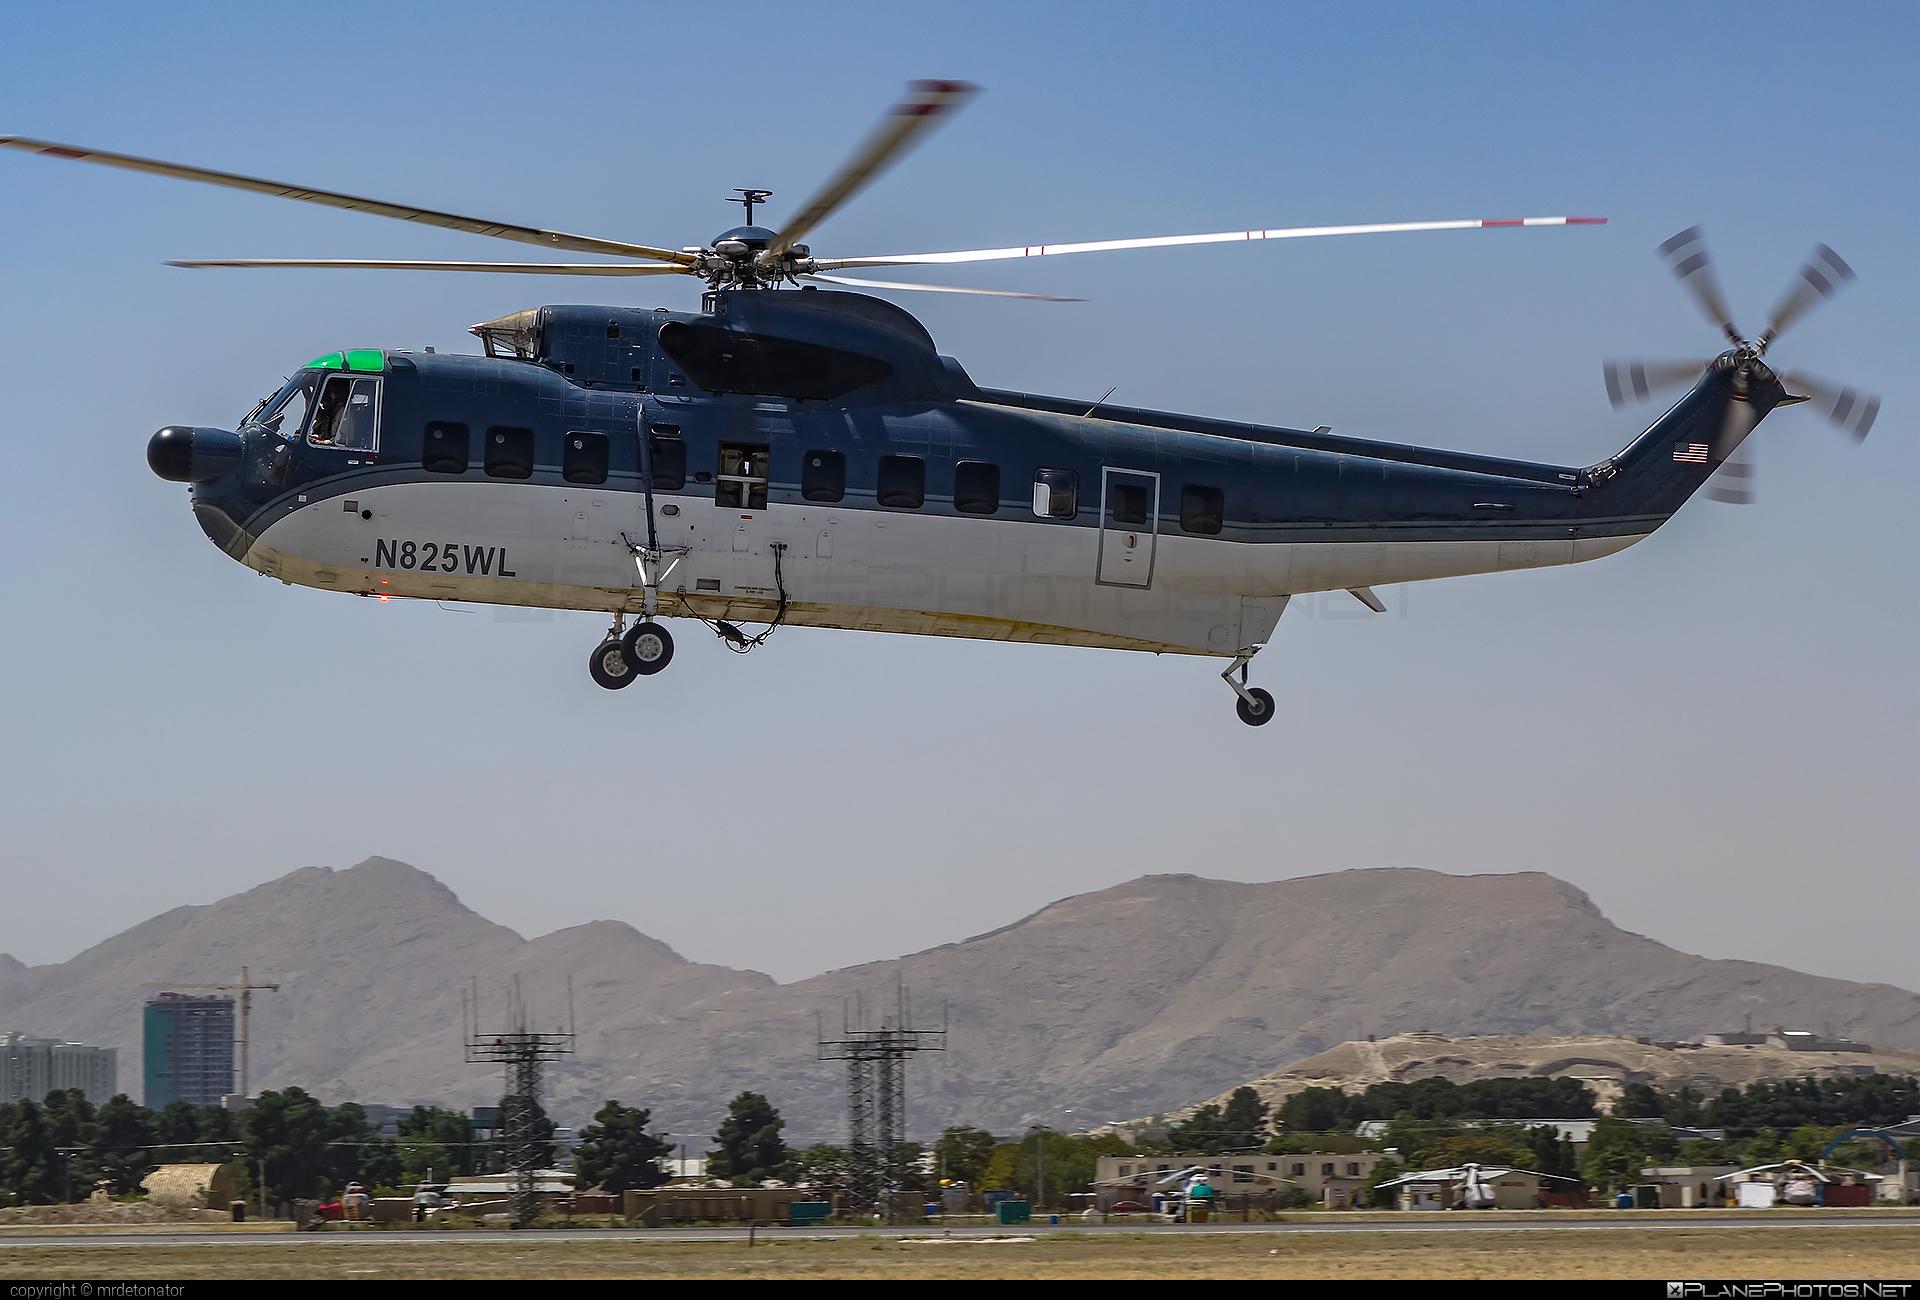 Sikorsky S-61N - N825WL operated by United States Department of State #DepartmentOfState #USdepartmentOfState #UnitedStatesDepartmentOfState #sikorsky